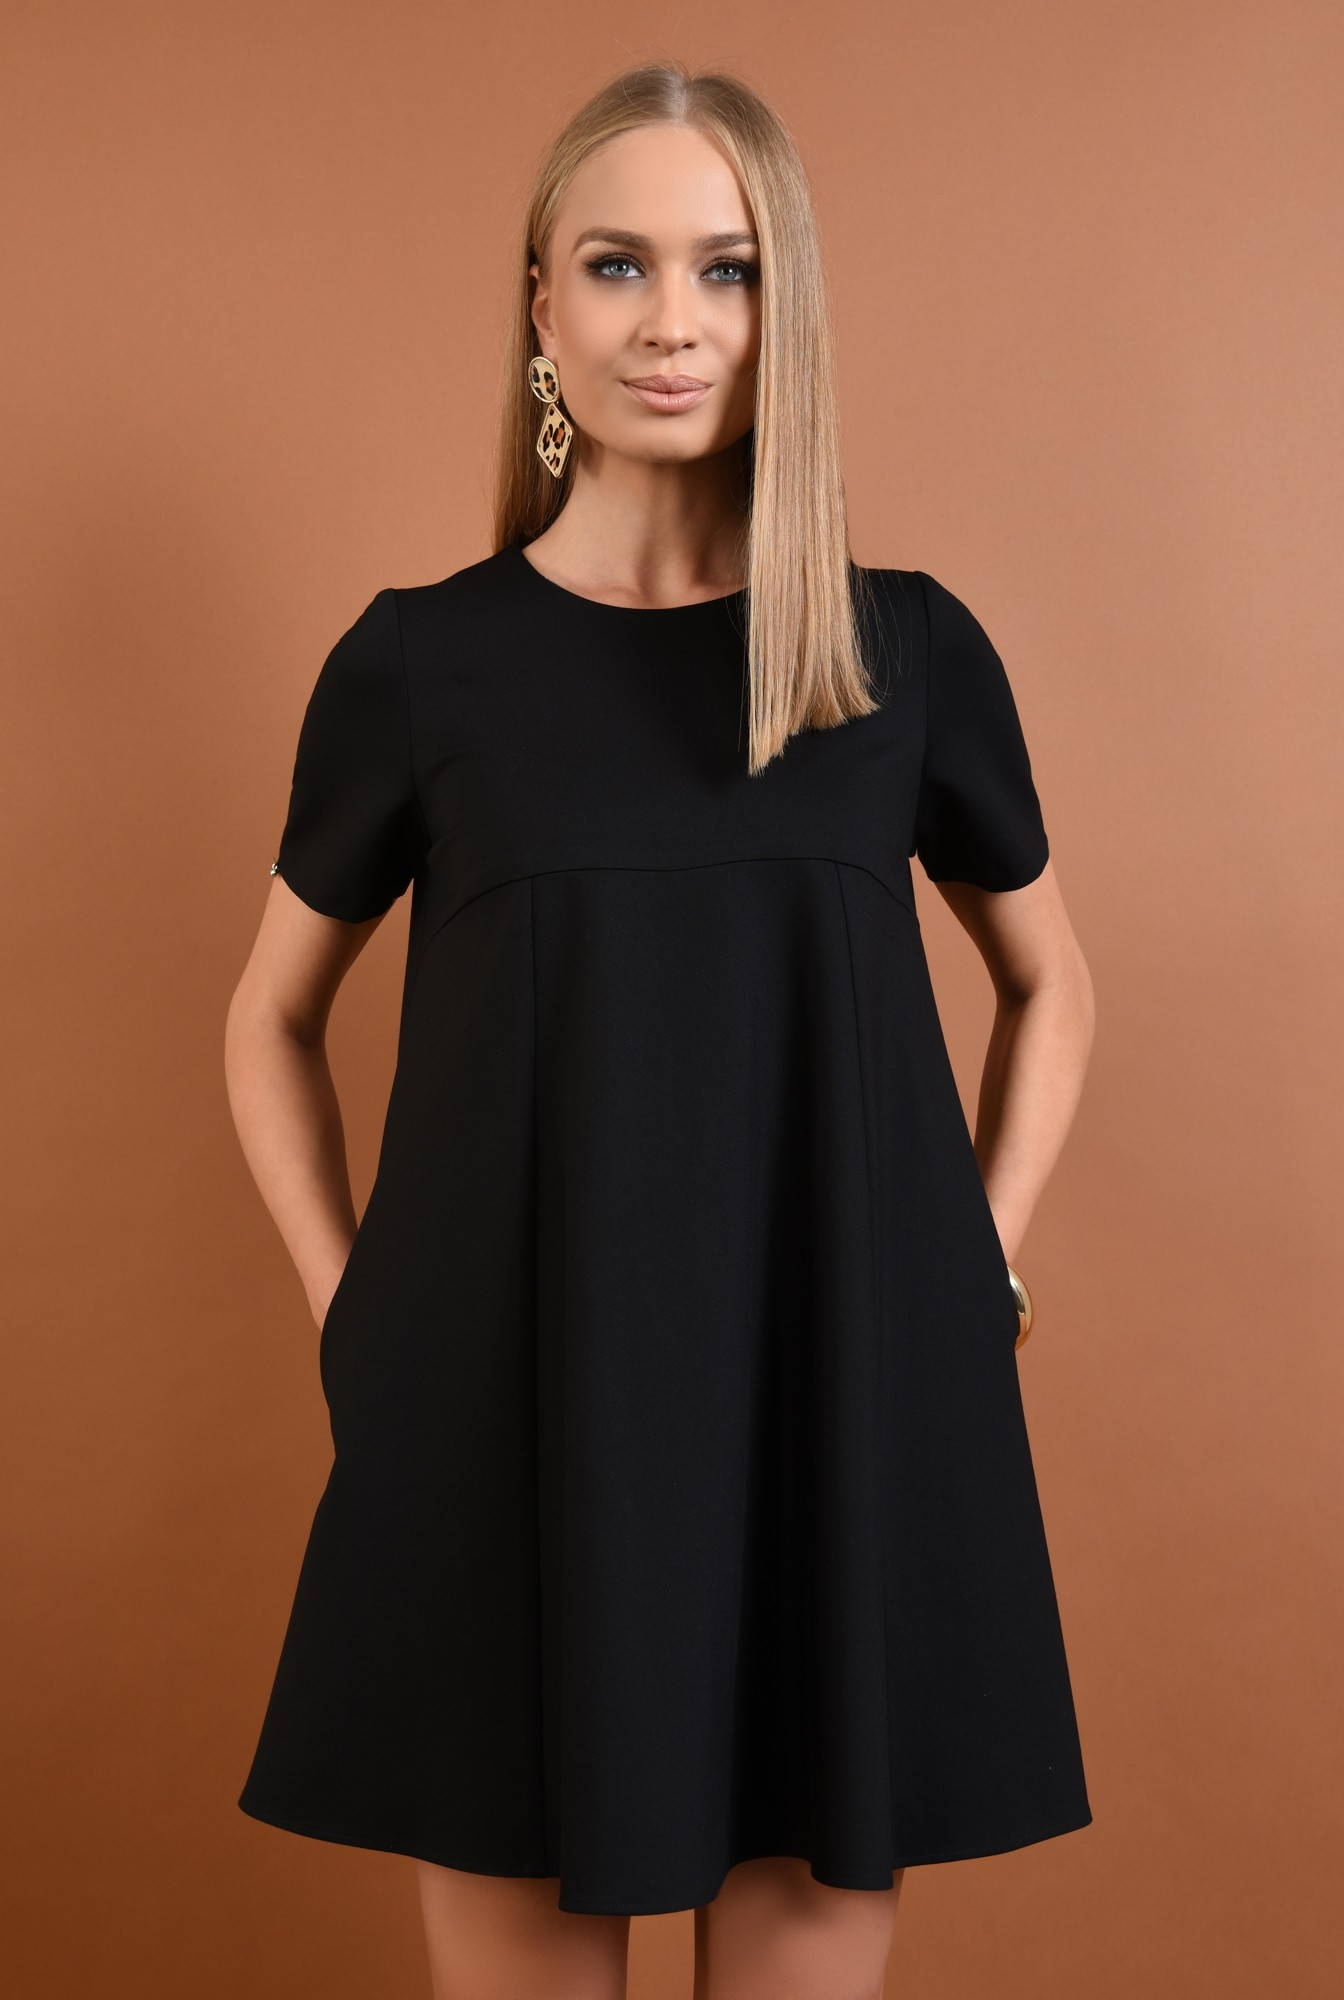 2 - rochie din tricot, neagra, scurta, croi evazat